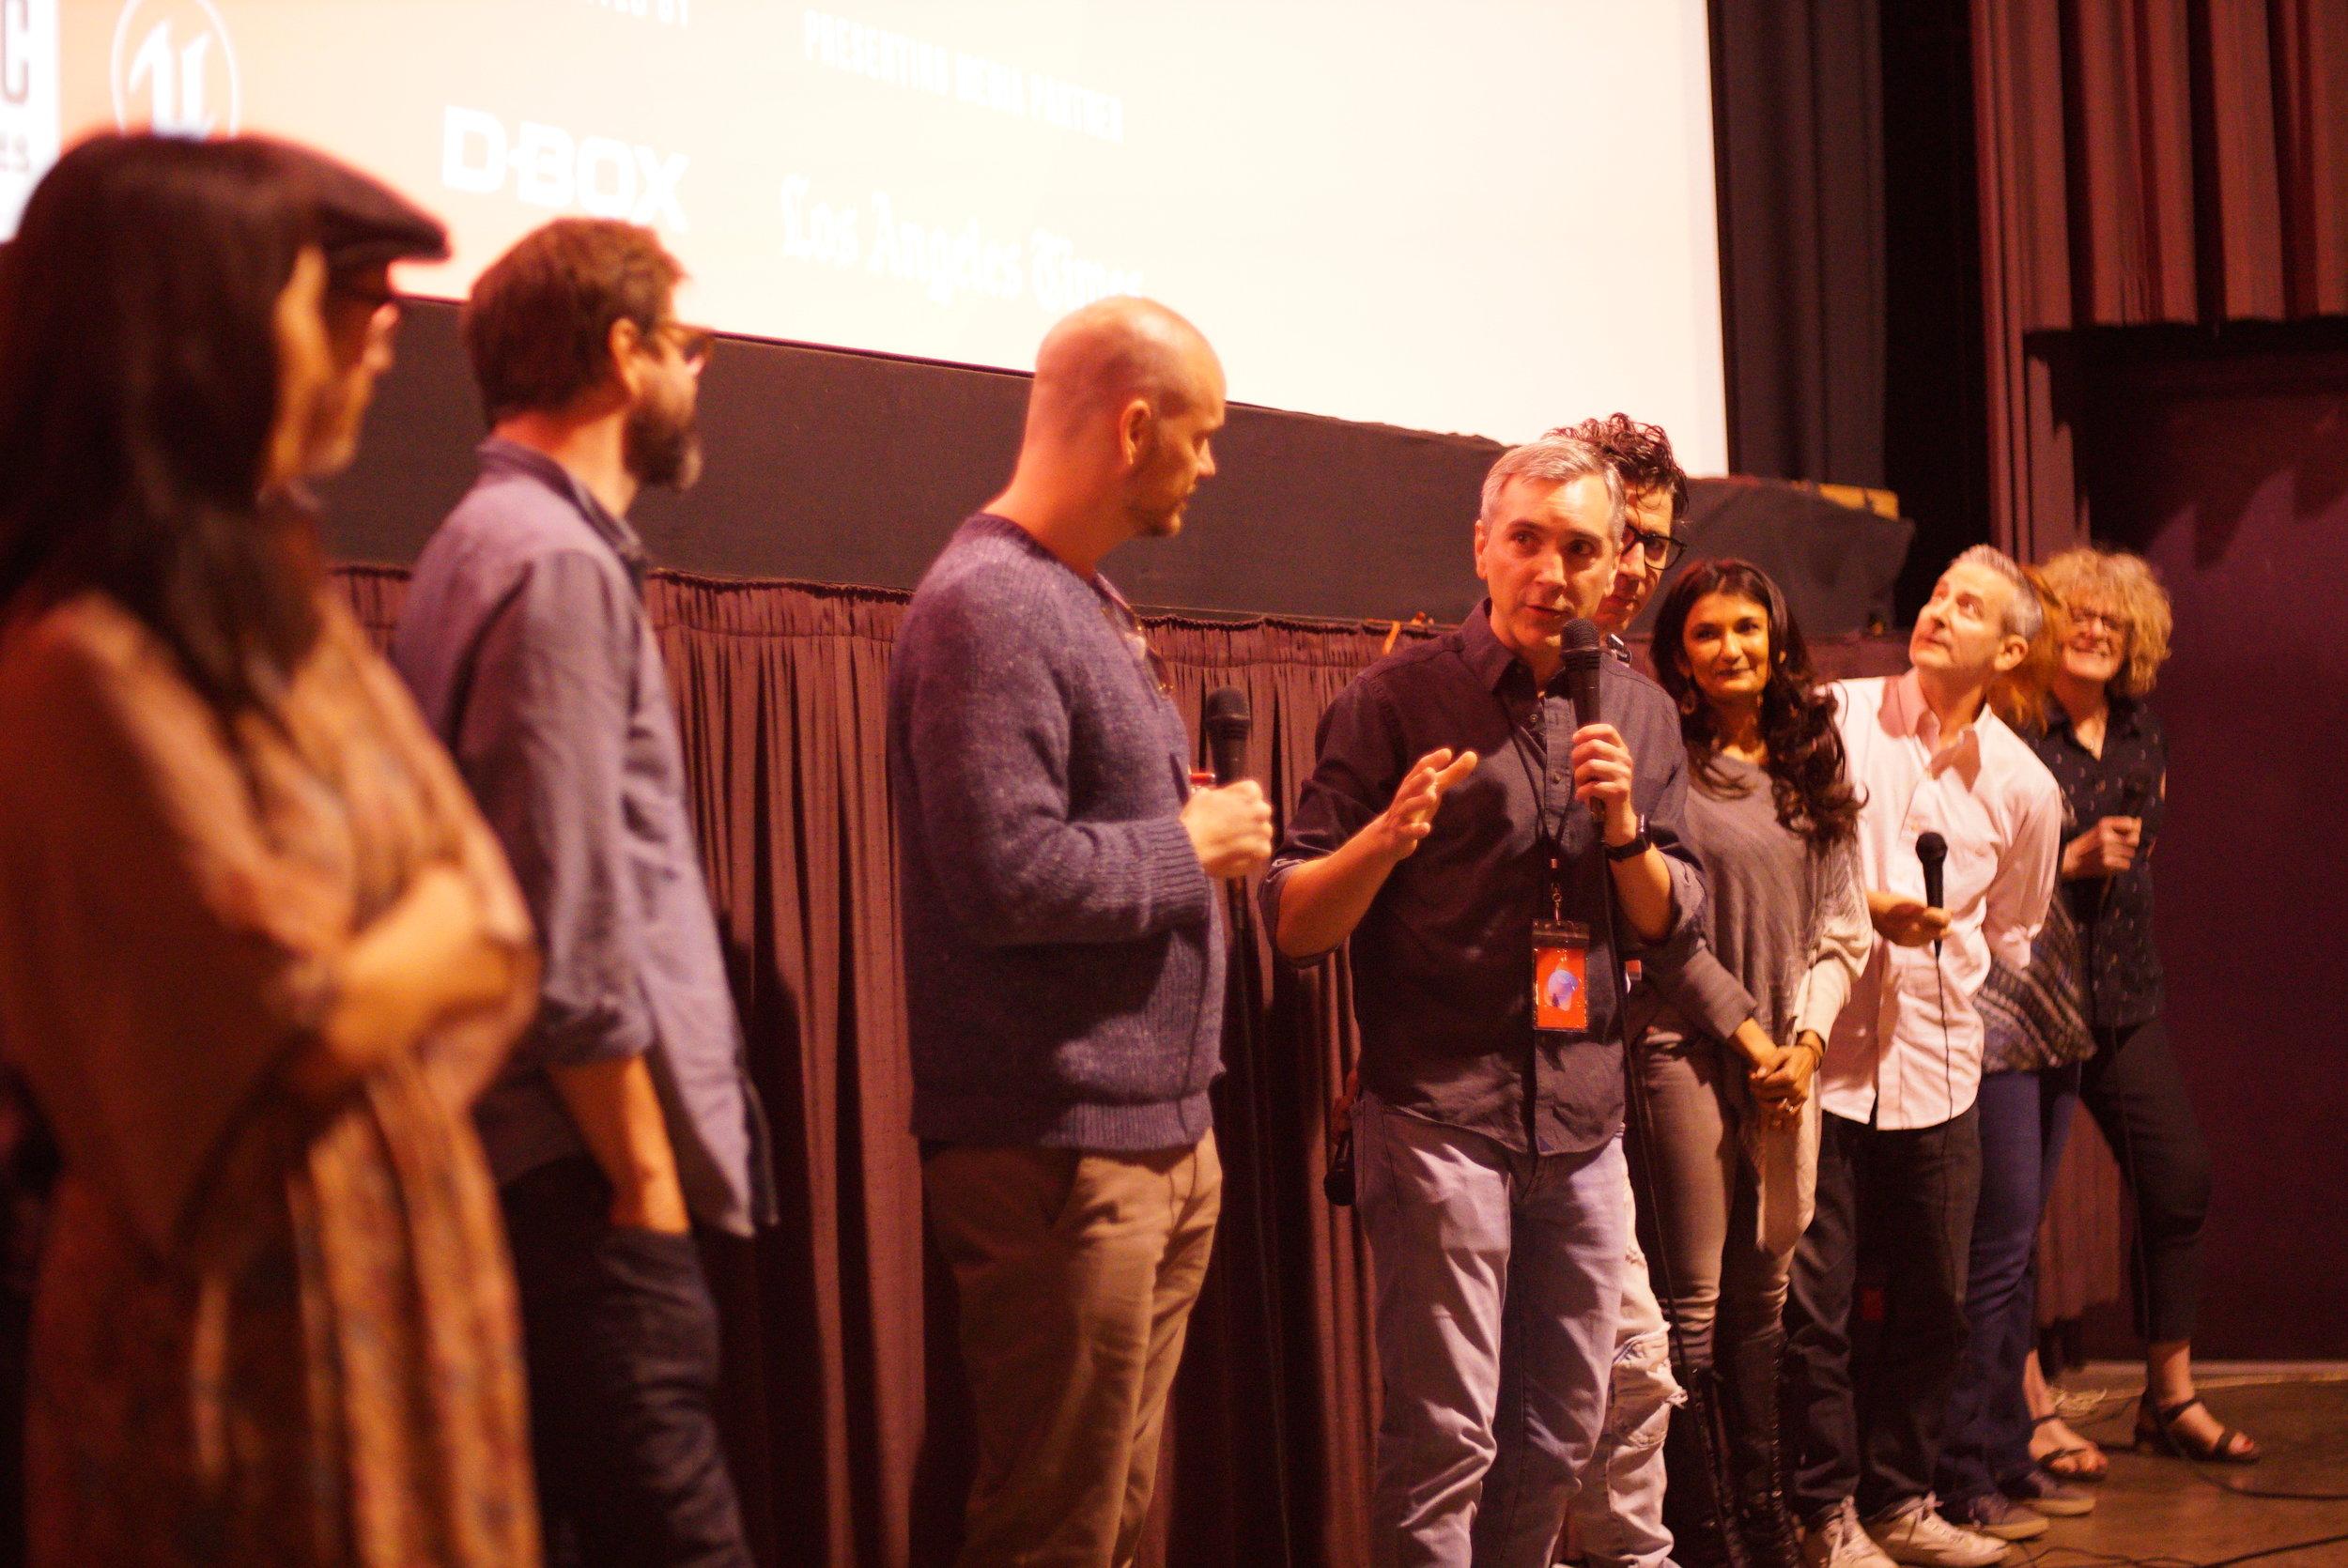 ADOPTABLE! screening at IFF 11/4/18 Q&A (l - r) Linda Park, Jeff Rosenthal, Gale Harold, Peter Paige, Scott, Monty Miranda, Anjali Bhimani, Eddie Jemison, Vana O'Brien